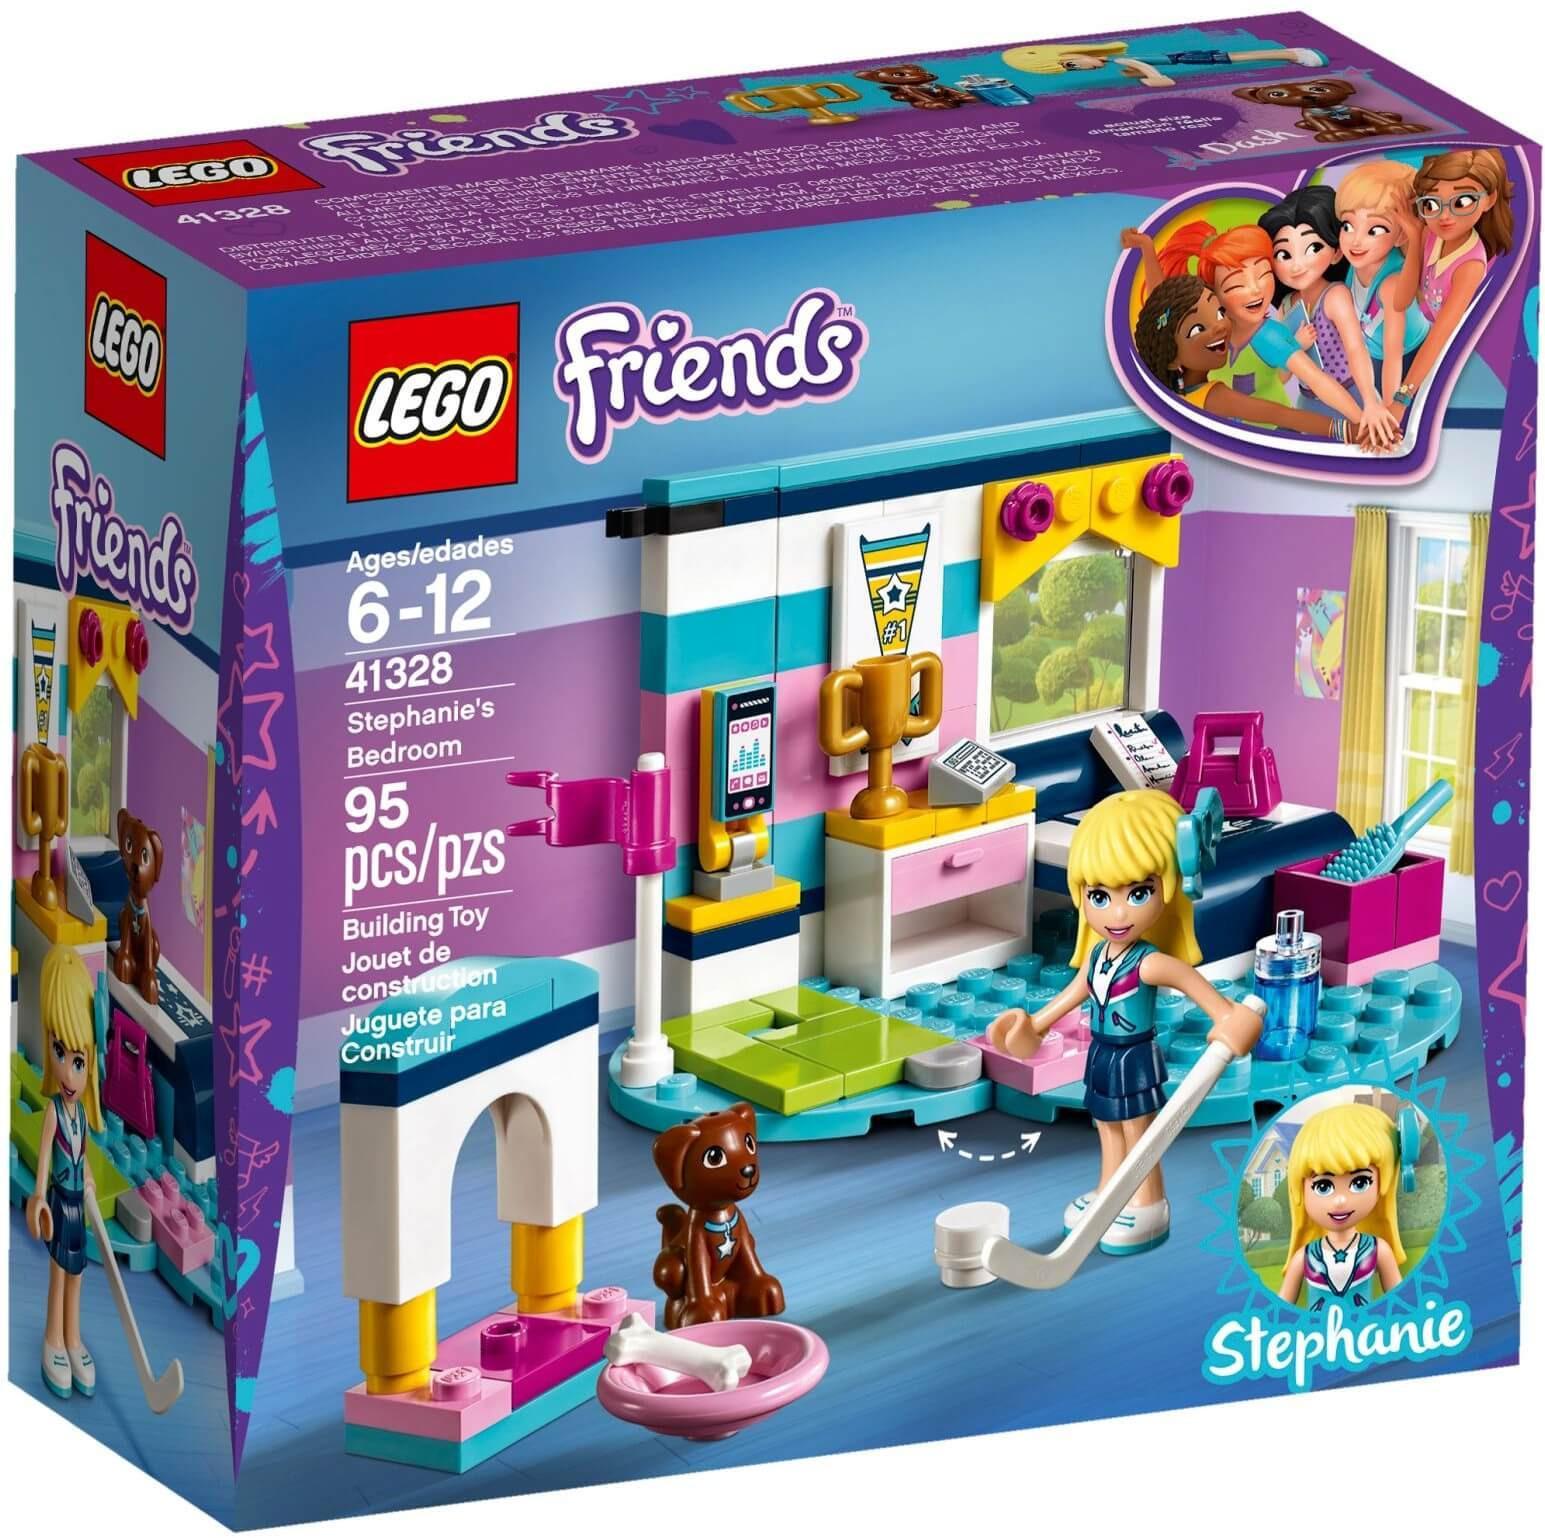 Mua đồ chơi LEGO Friends 41328 - Phòng Ngủ của Stephanie (LEGO Friends 41328 Stephanies Bedroom)